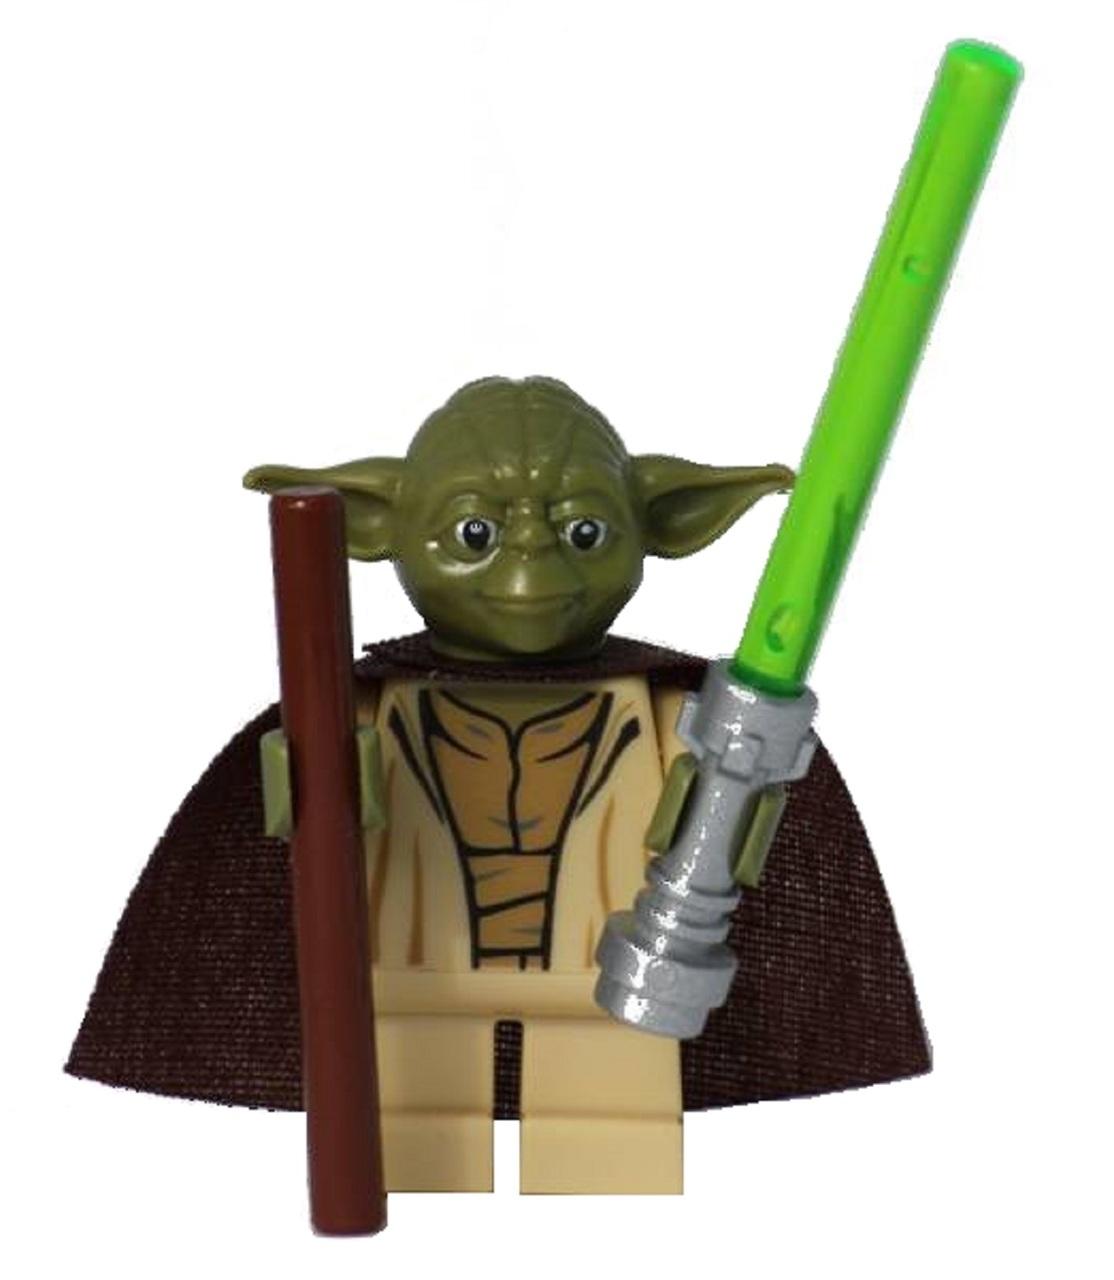 lego star wars yoda minifig with stick and custom cape